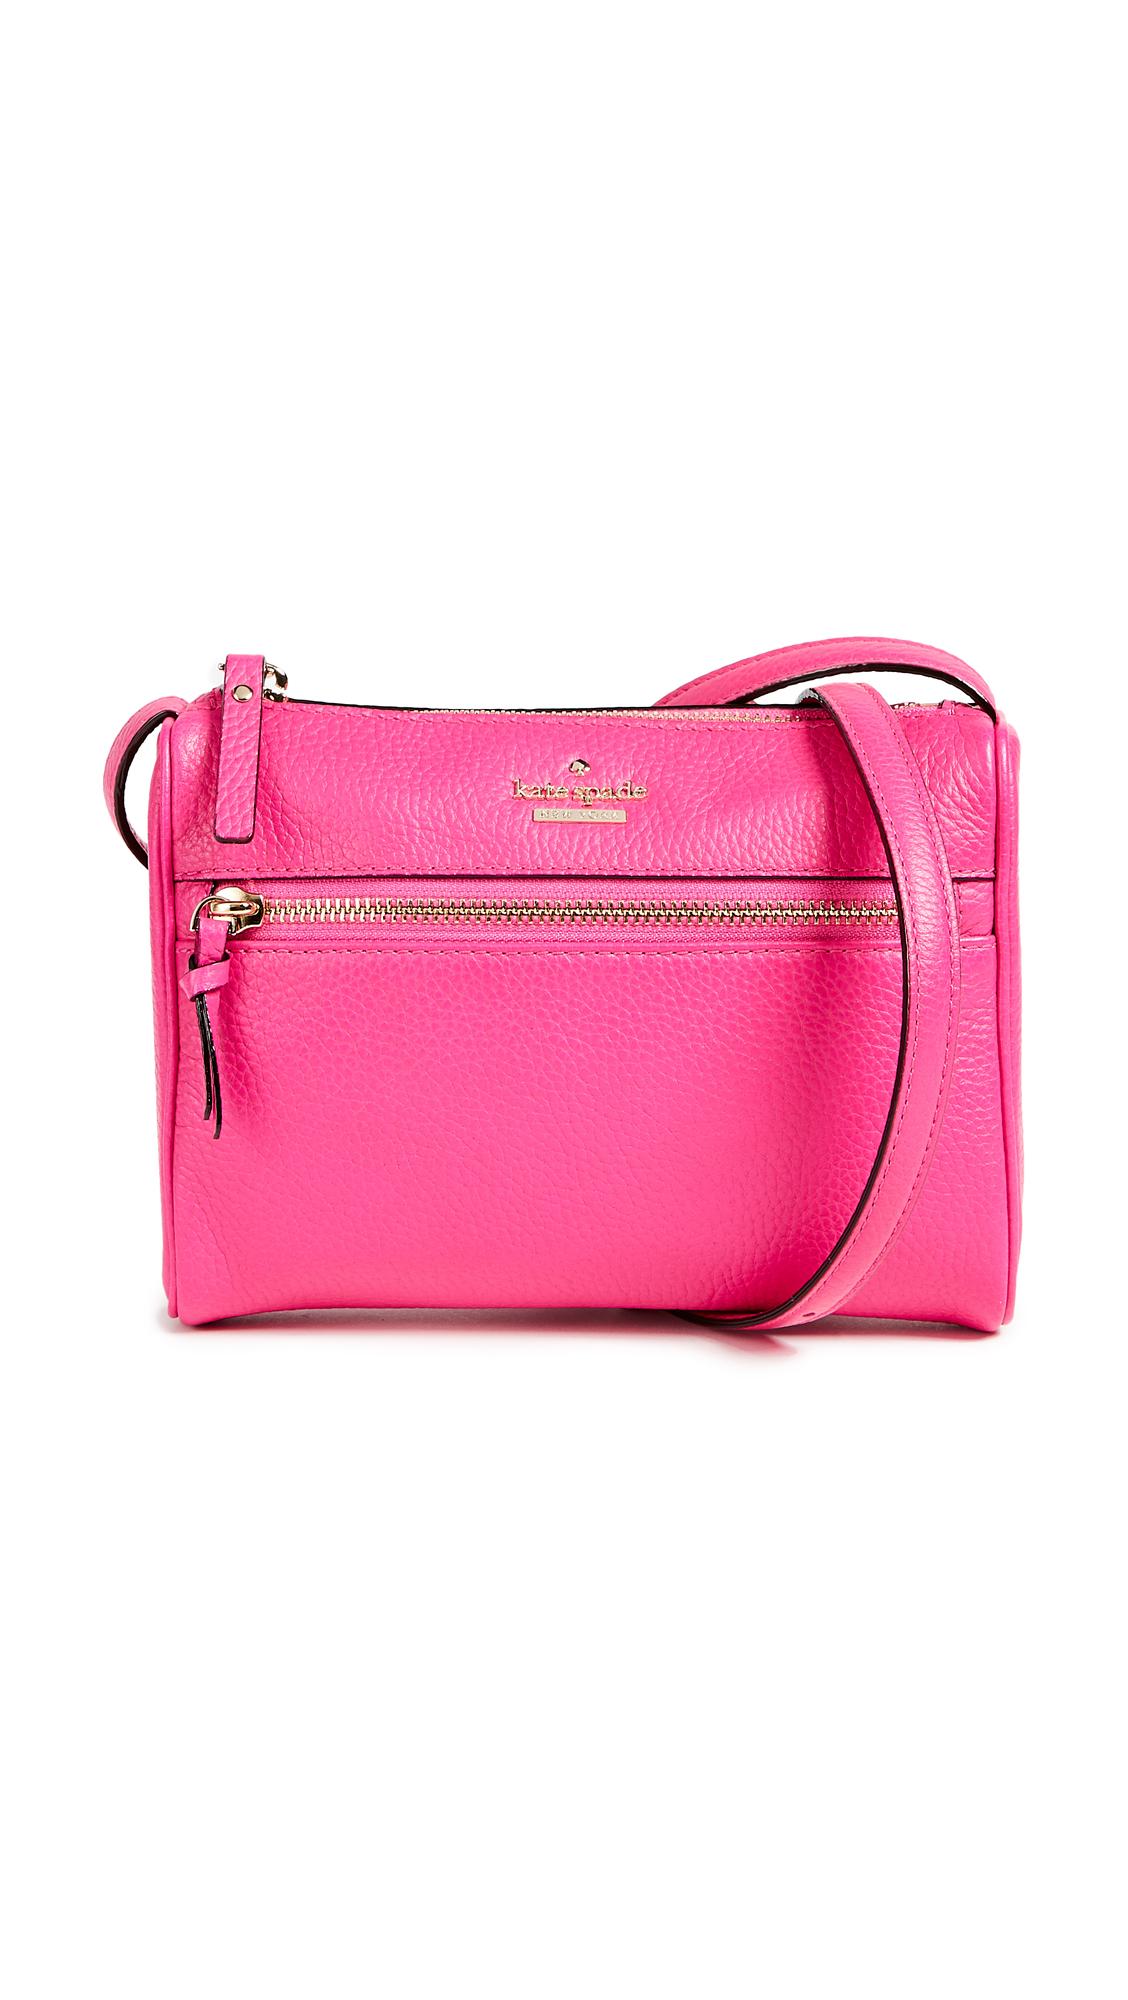 Kate Spade New York Jackson Street Mini Cayli Bag - Peony Pink